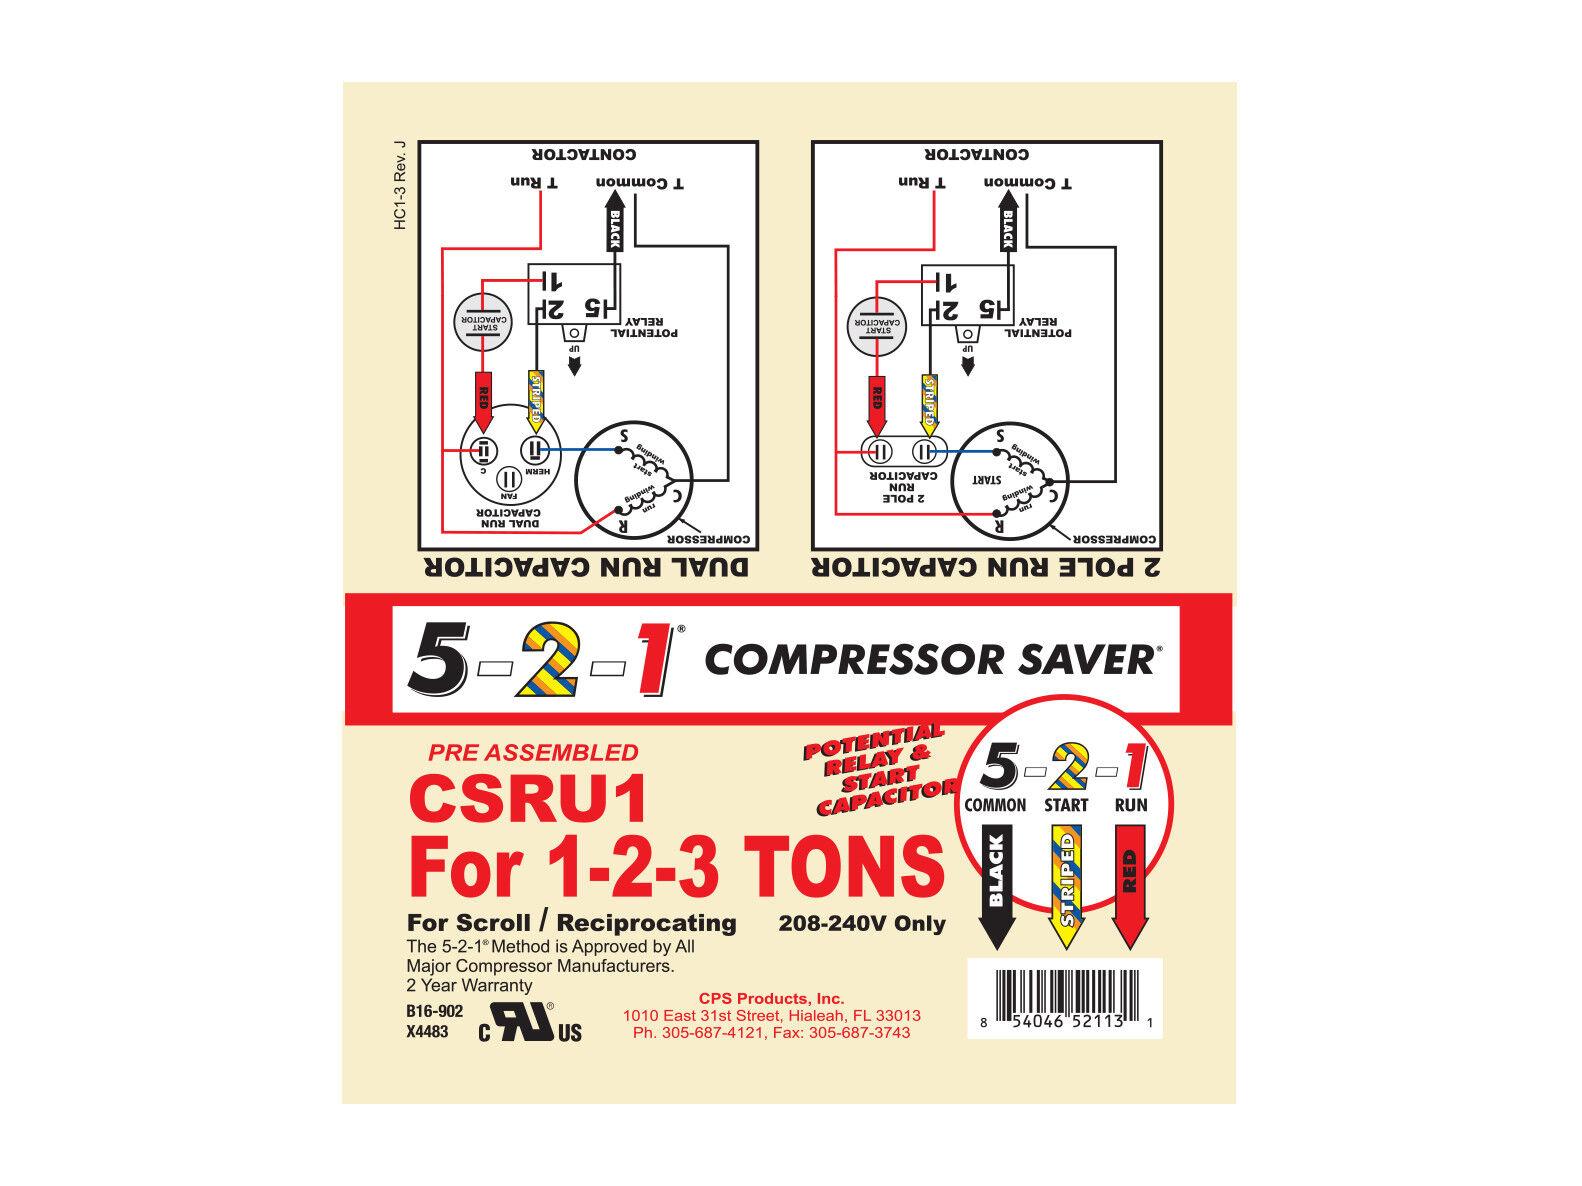 Farad Capacitor Wiring Diagram Power Acoustik Diagrams Source Compressor Saver U Hard Start Ebay Com At Res Content